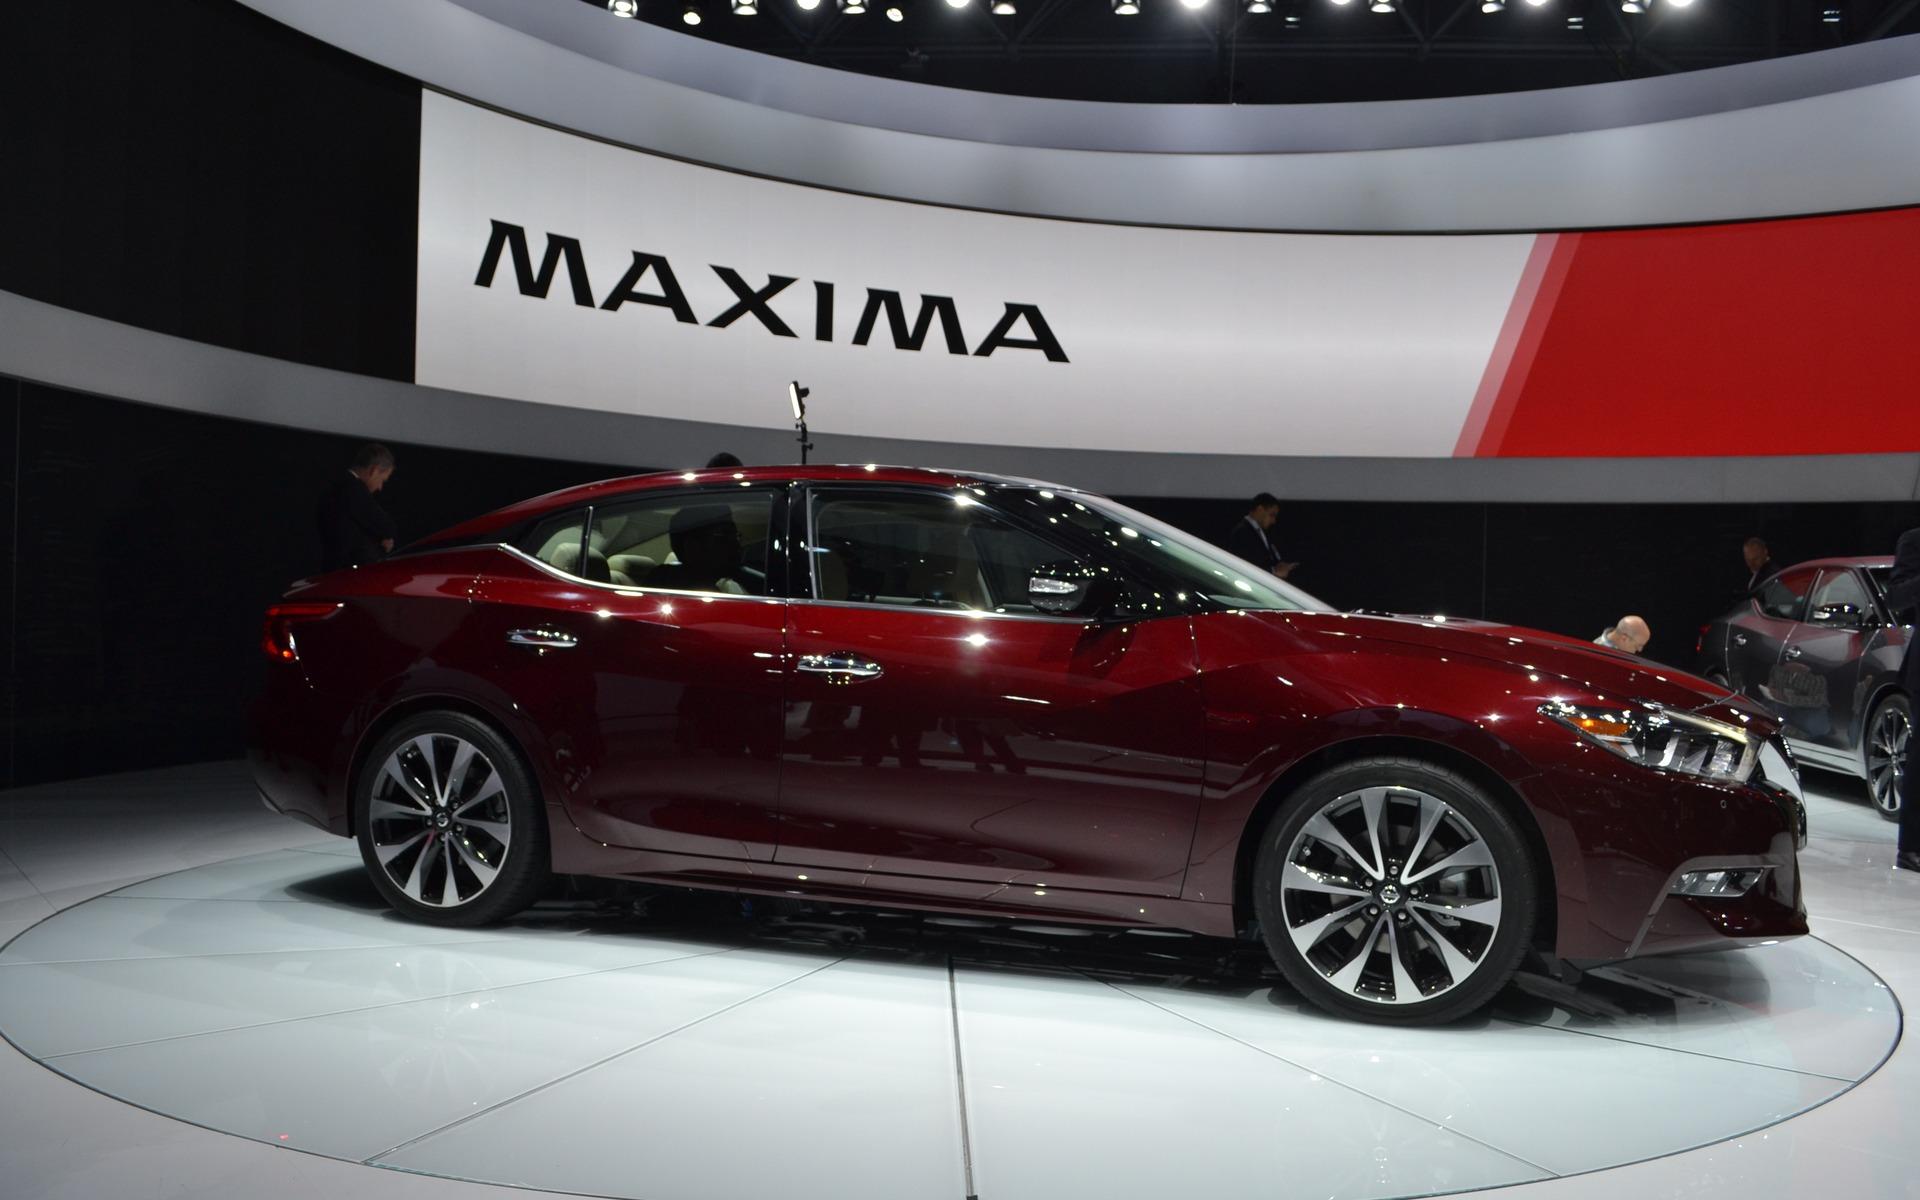 The 2016 Nissan Maxima.